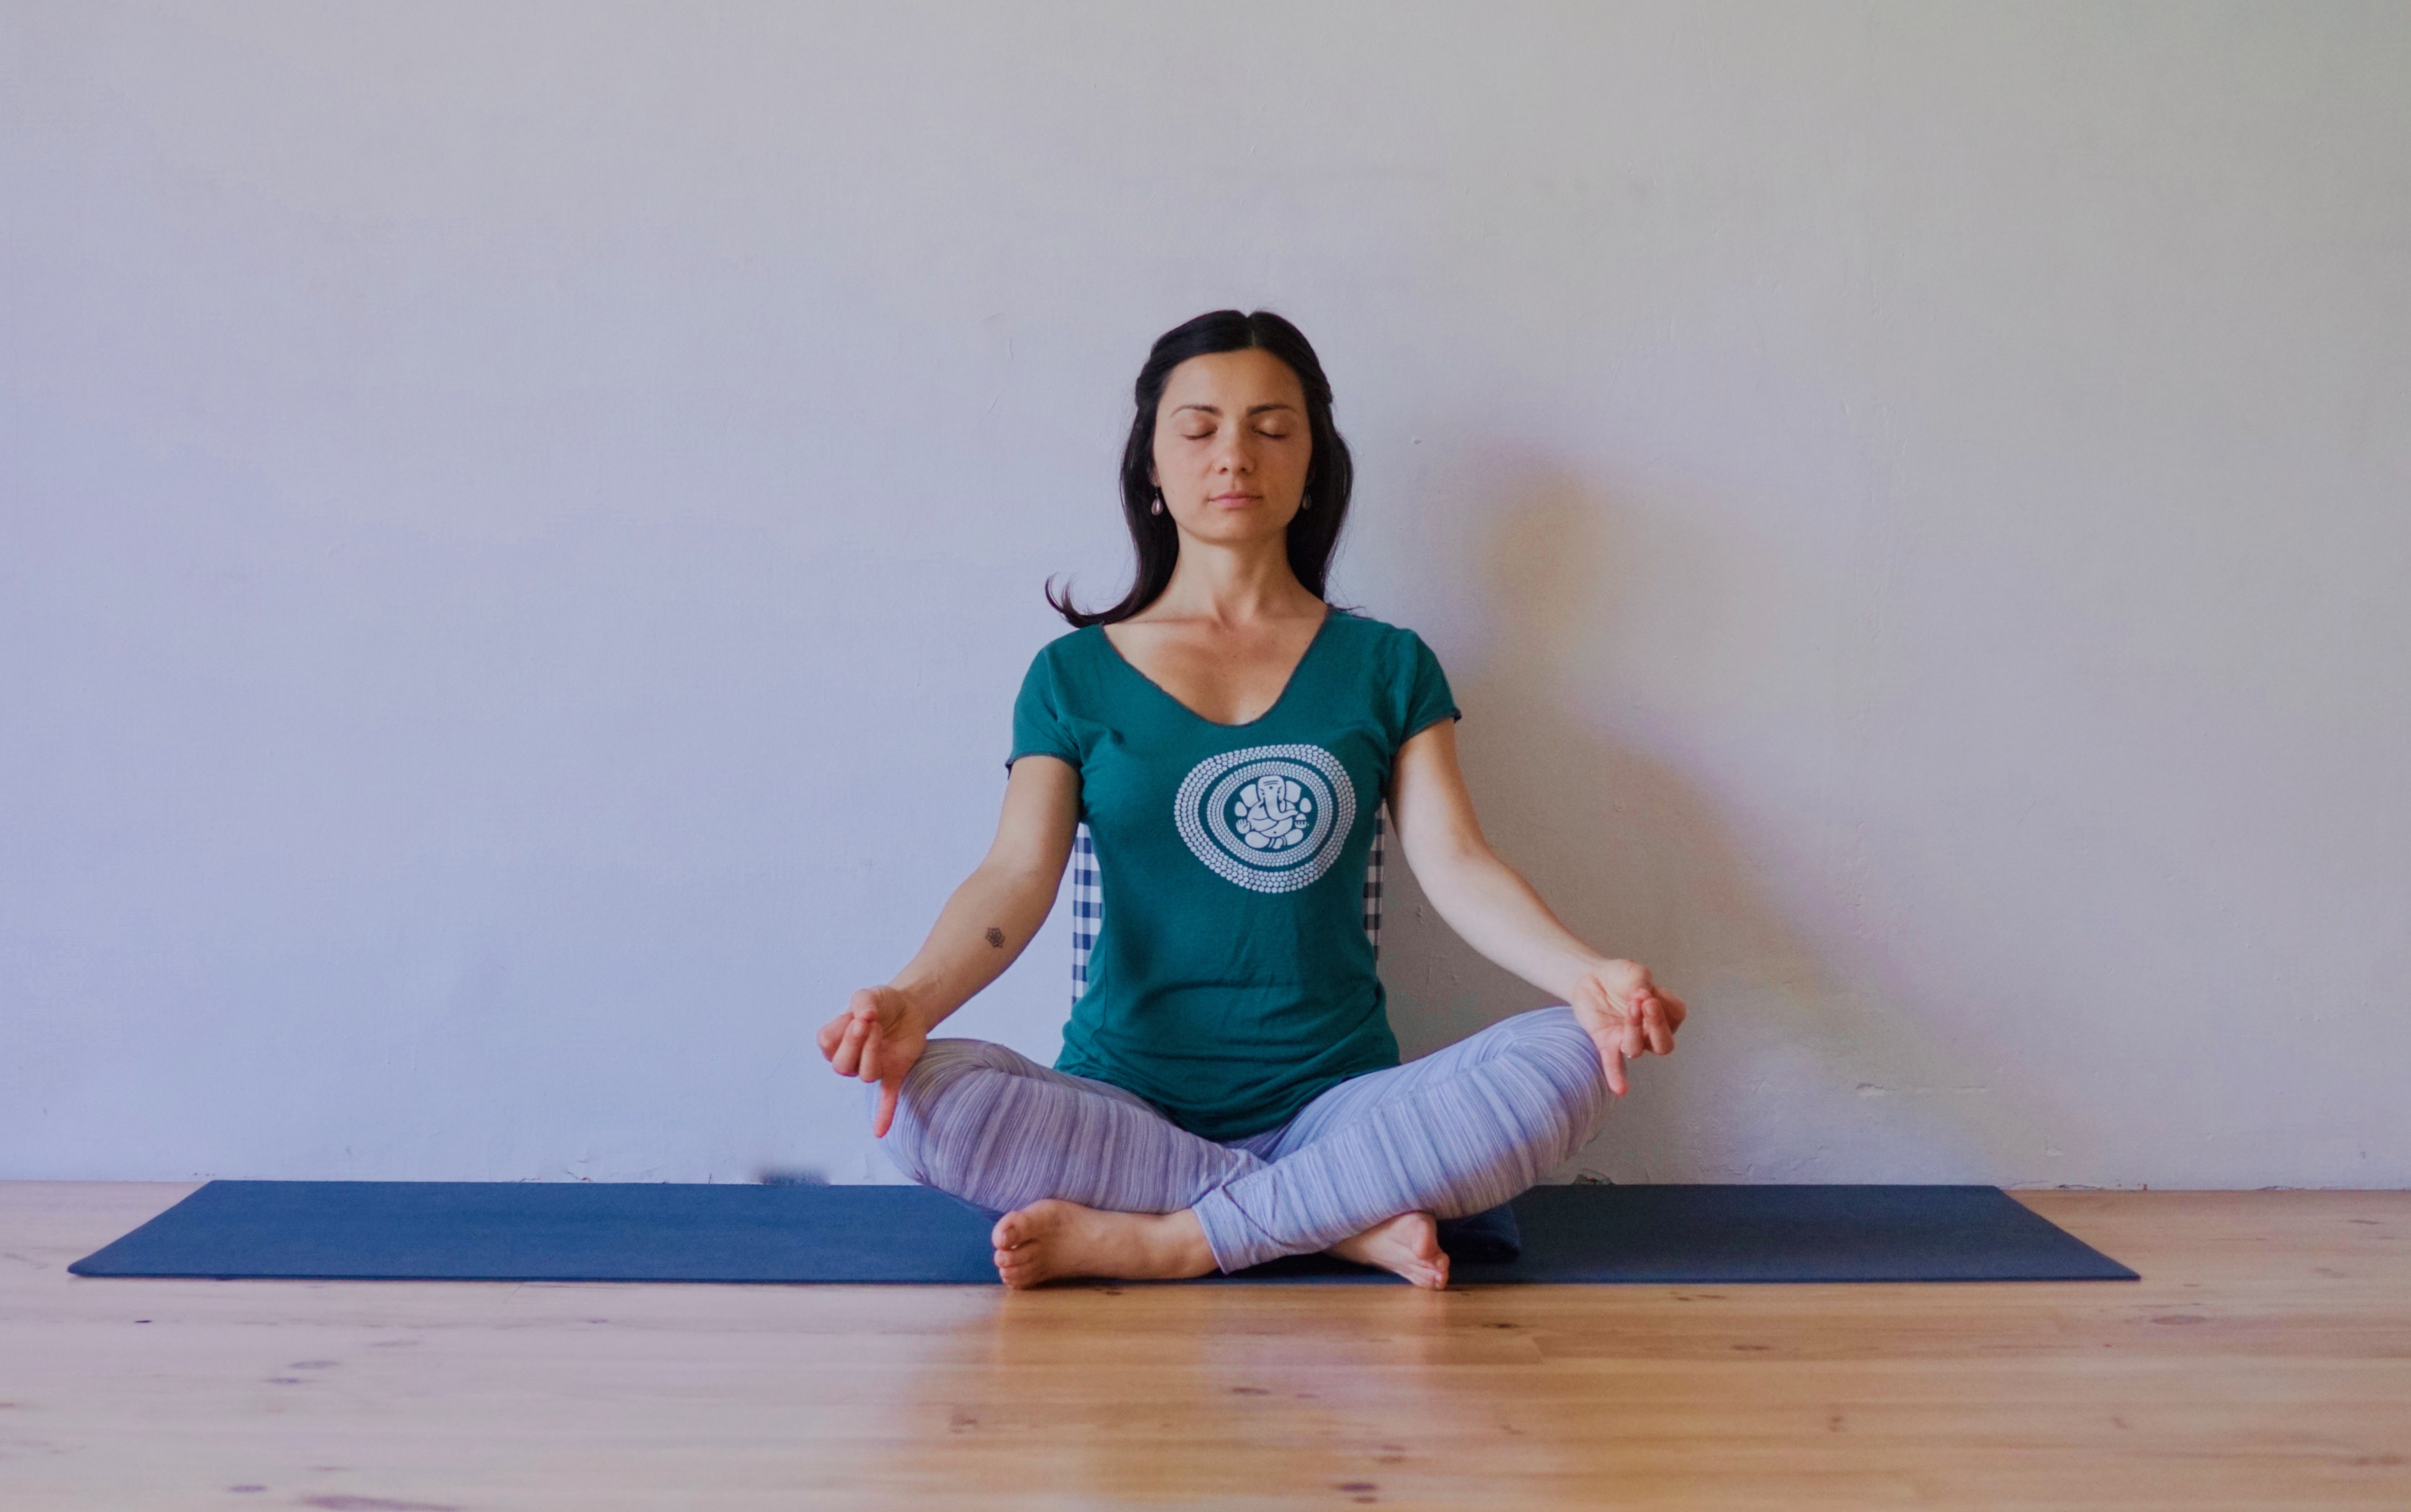 Yoga For Lower Back Pain During Menstruation